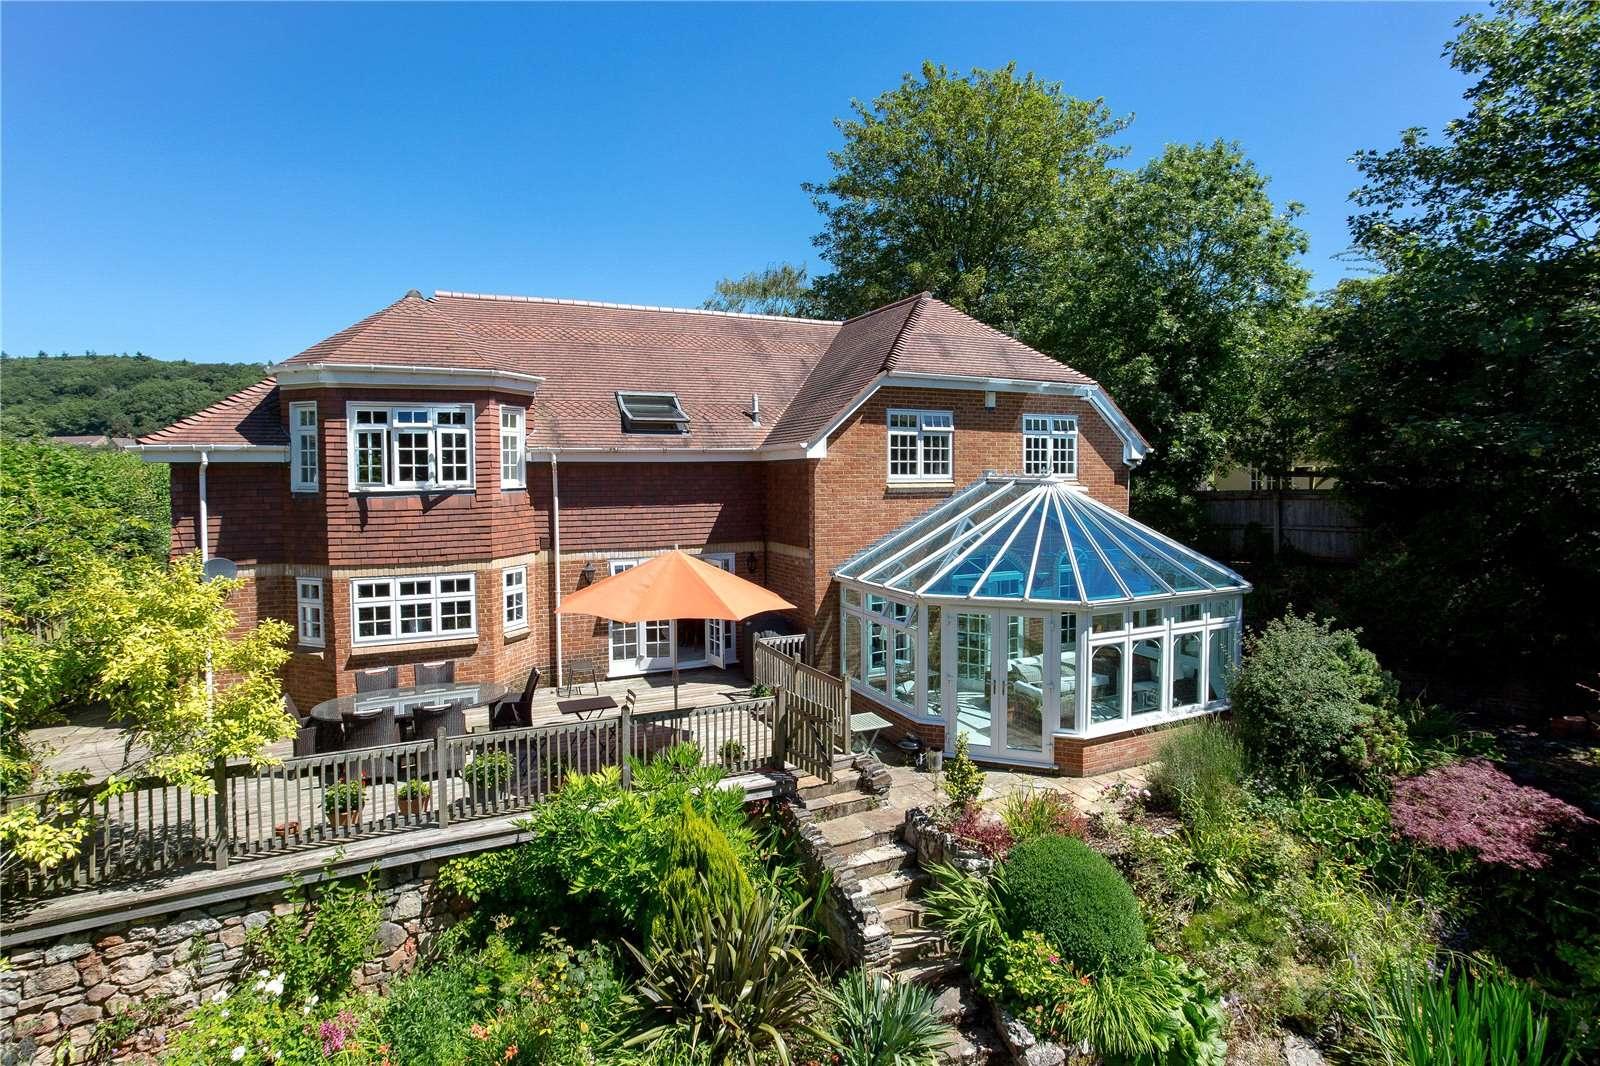 Savills   Clevedon Road, Flax Bourton, Bristol, BS48 1NQ   Properties for  sale